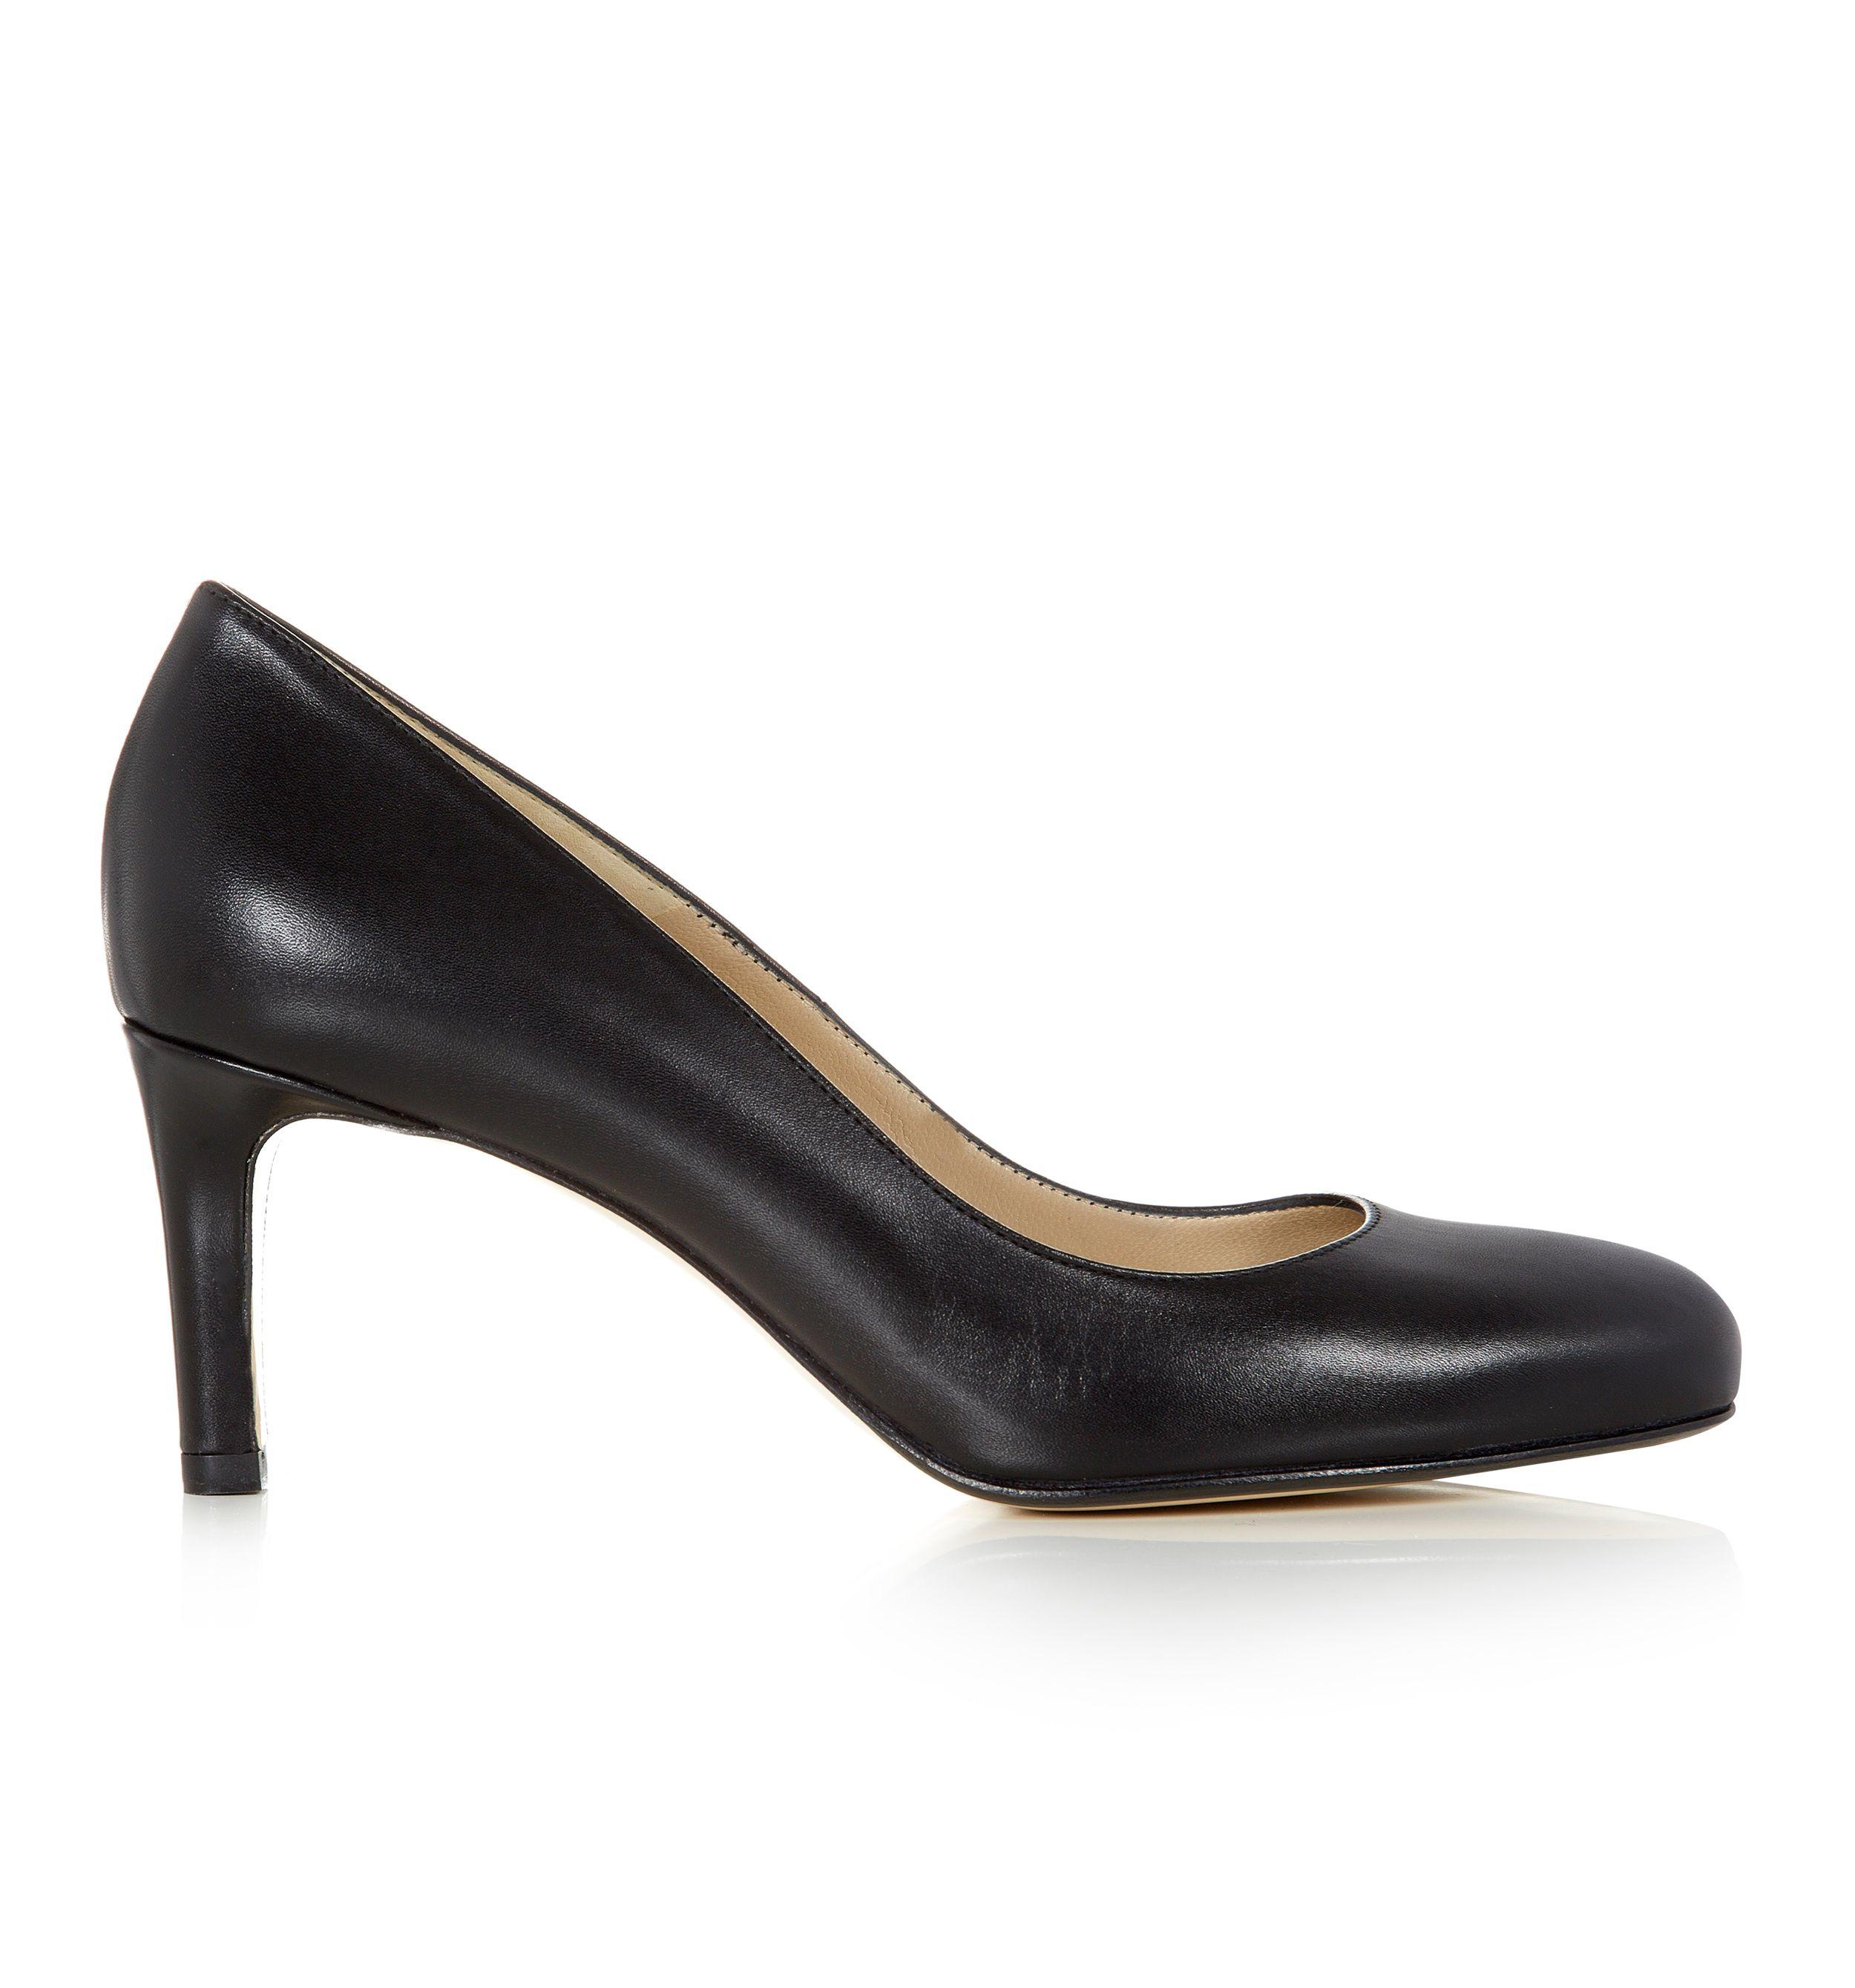 Hobbs Lizzie Court Shoes